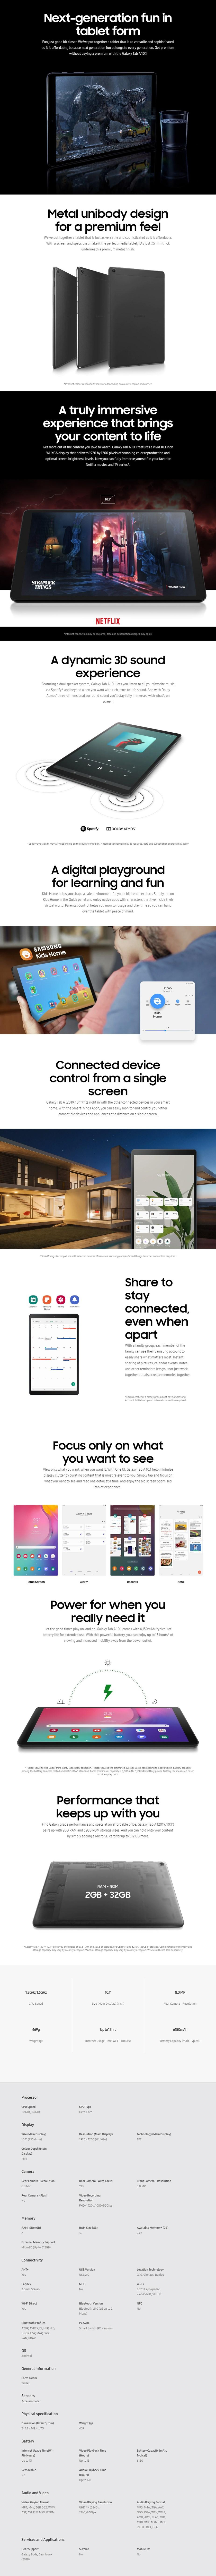 "Samsung Galaxy Tab A 10.1"" 2GB 32GB Wi-Fi - Overview 1"